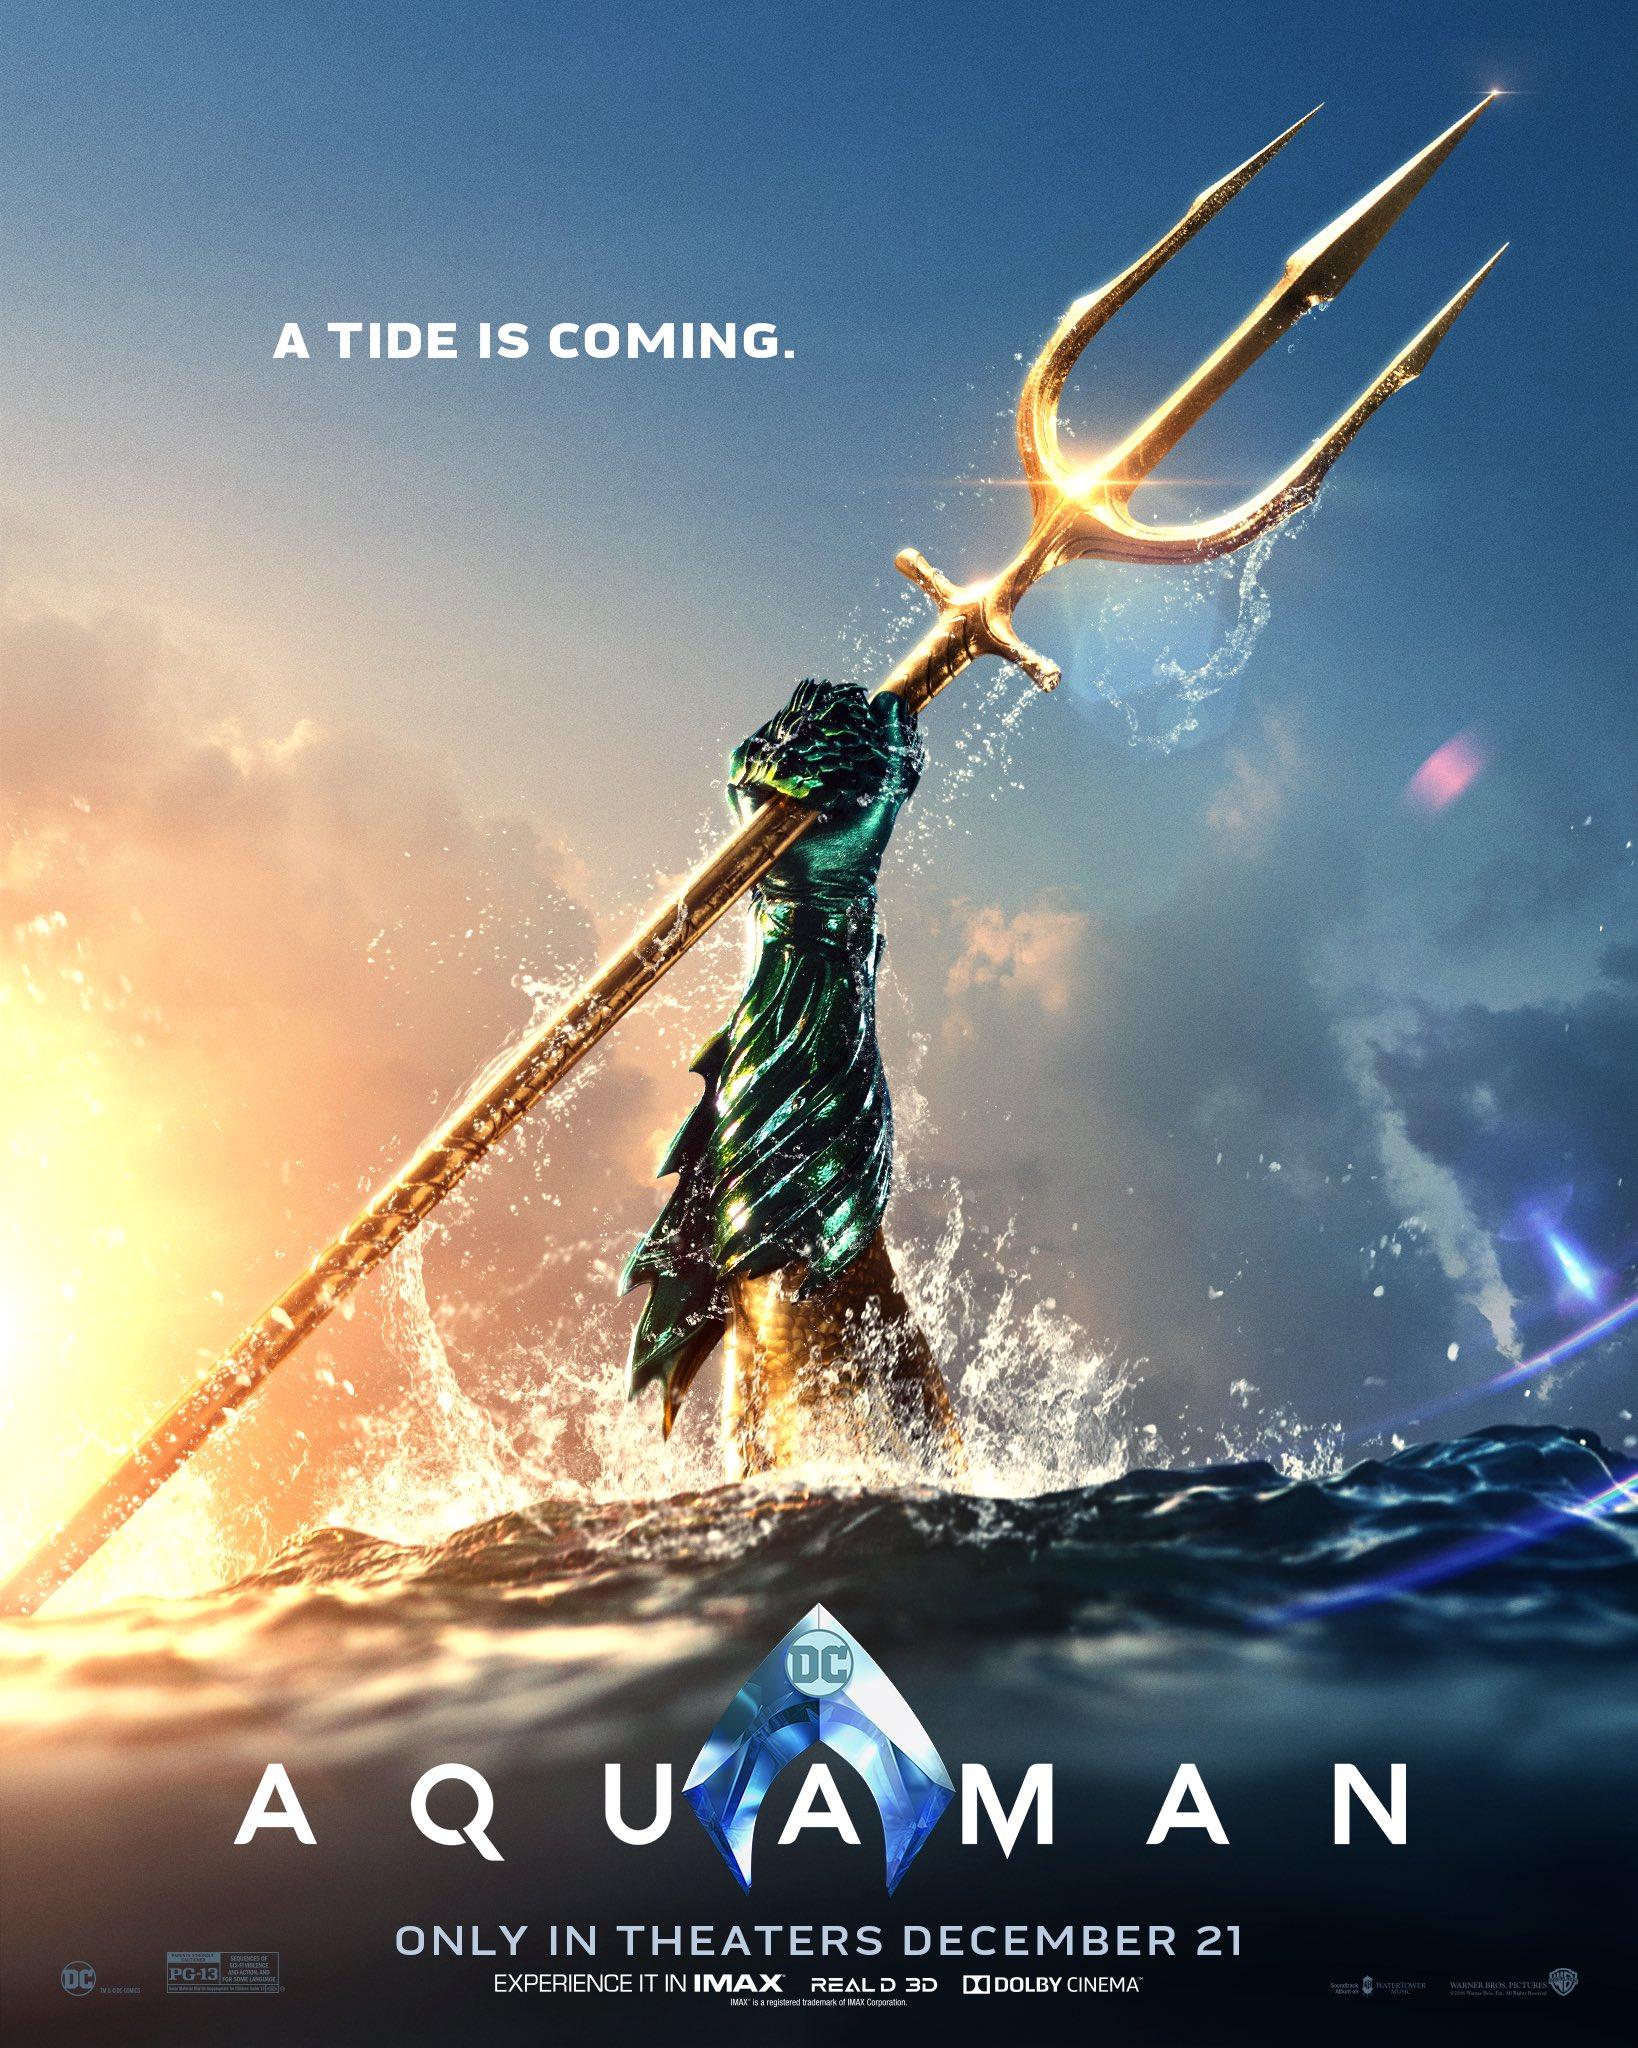 The King of Atlantis Rises in the New Aquaman Trailer